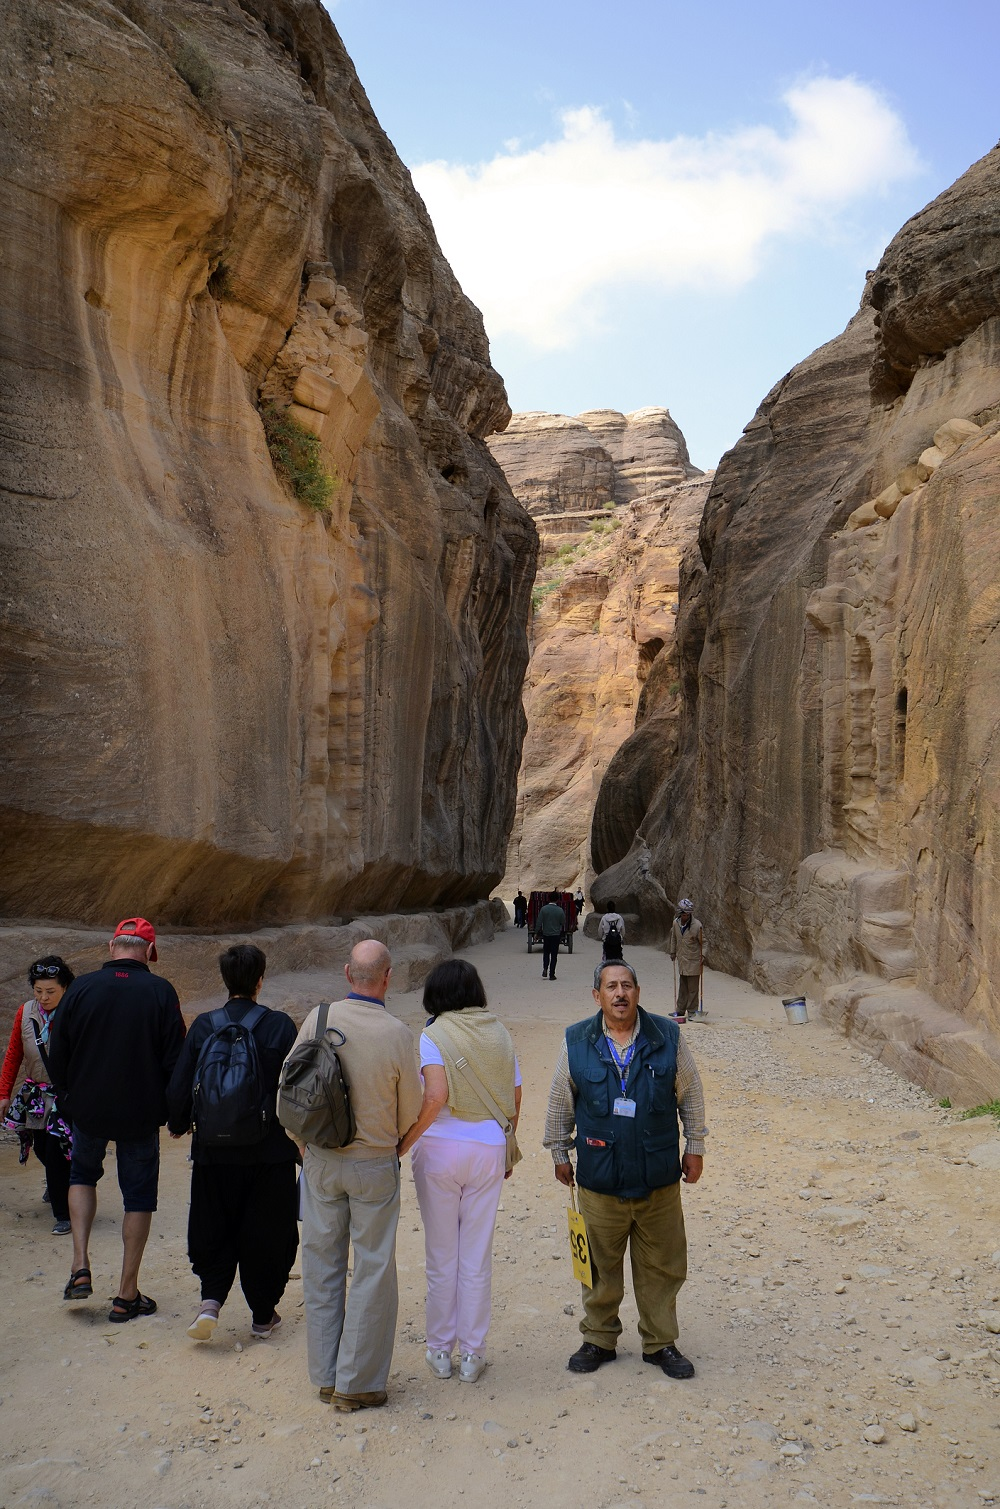 Tourists and tour guide in Petra Jordan